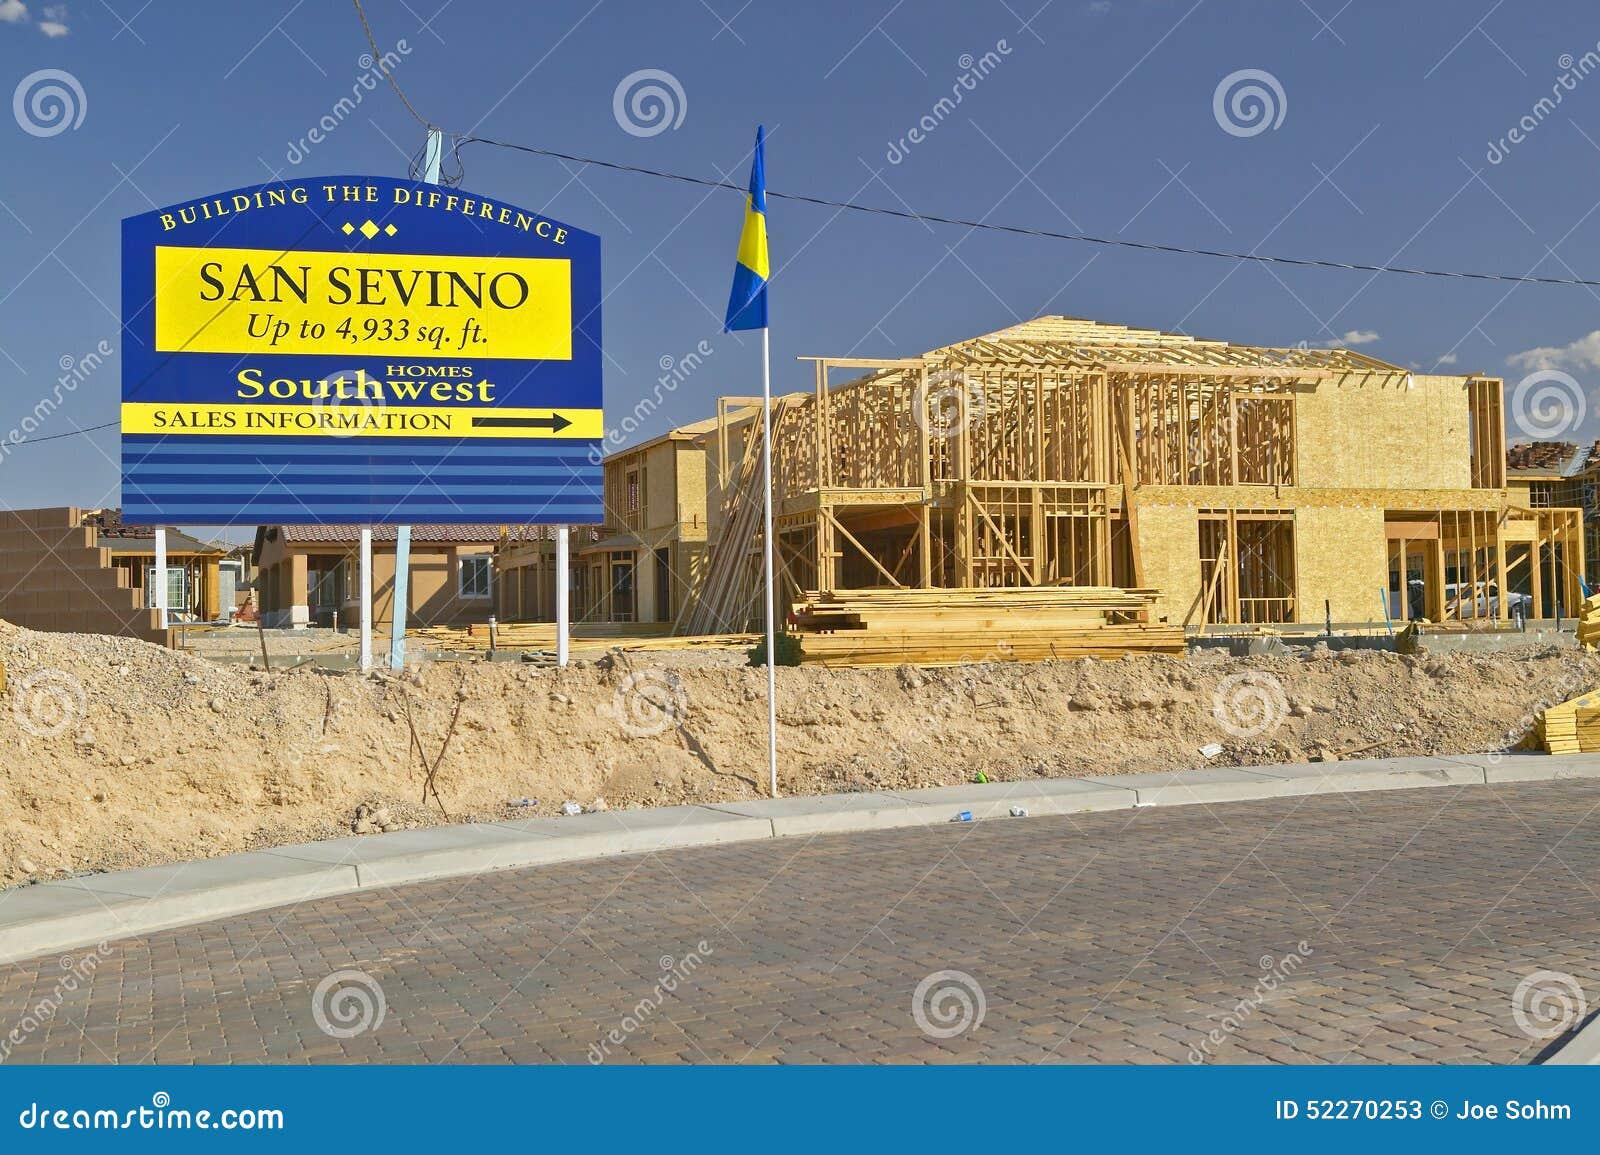 Clark County Building Department Las Vegas Nevada